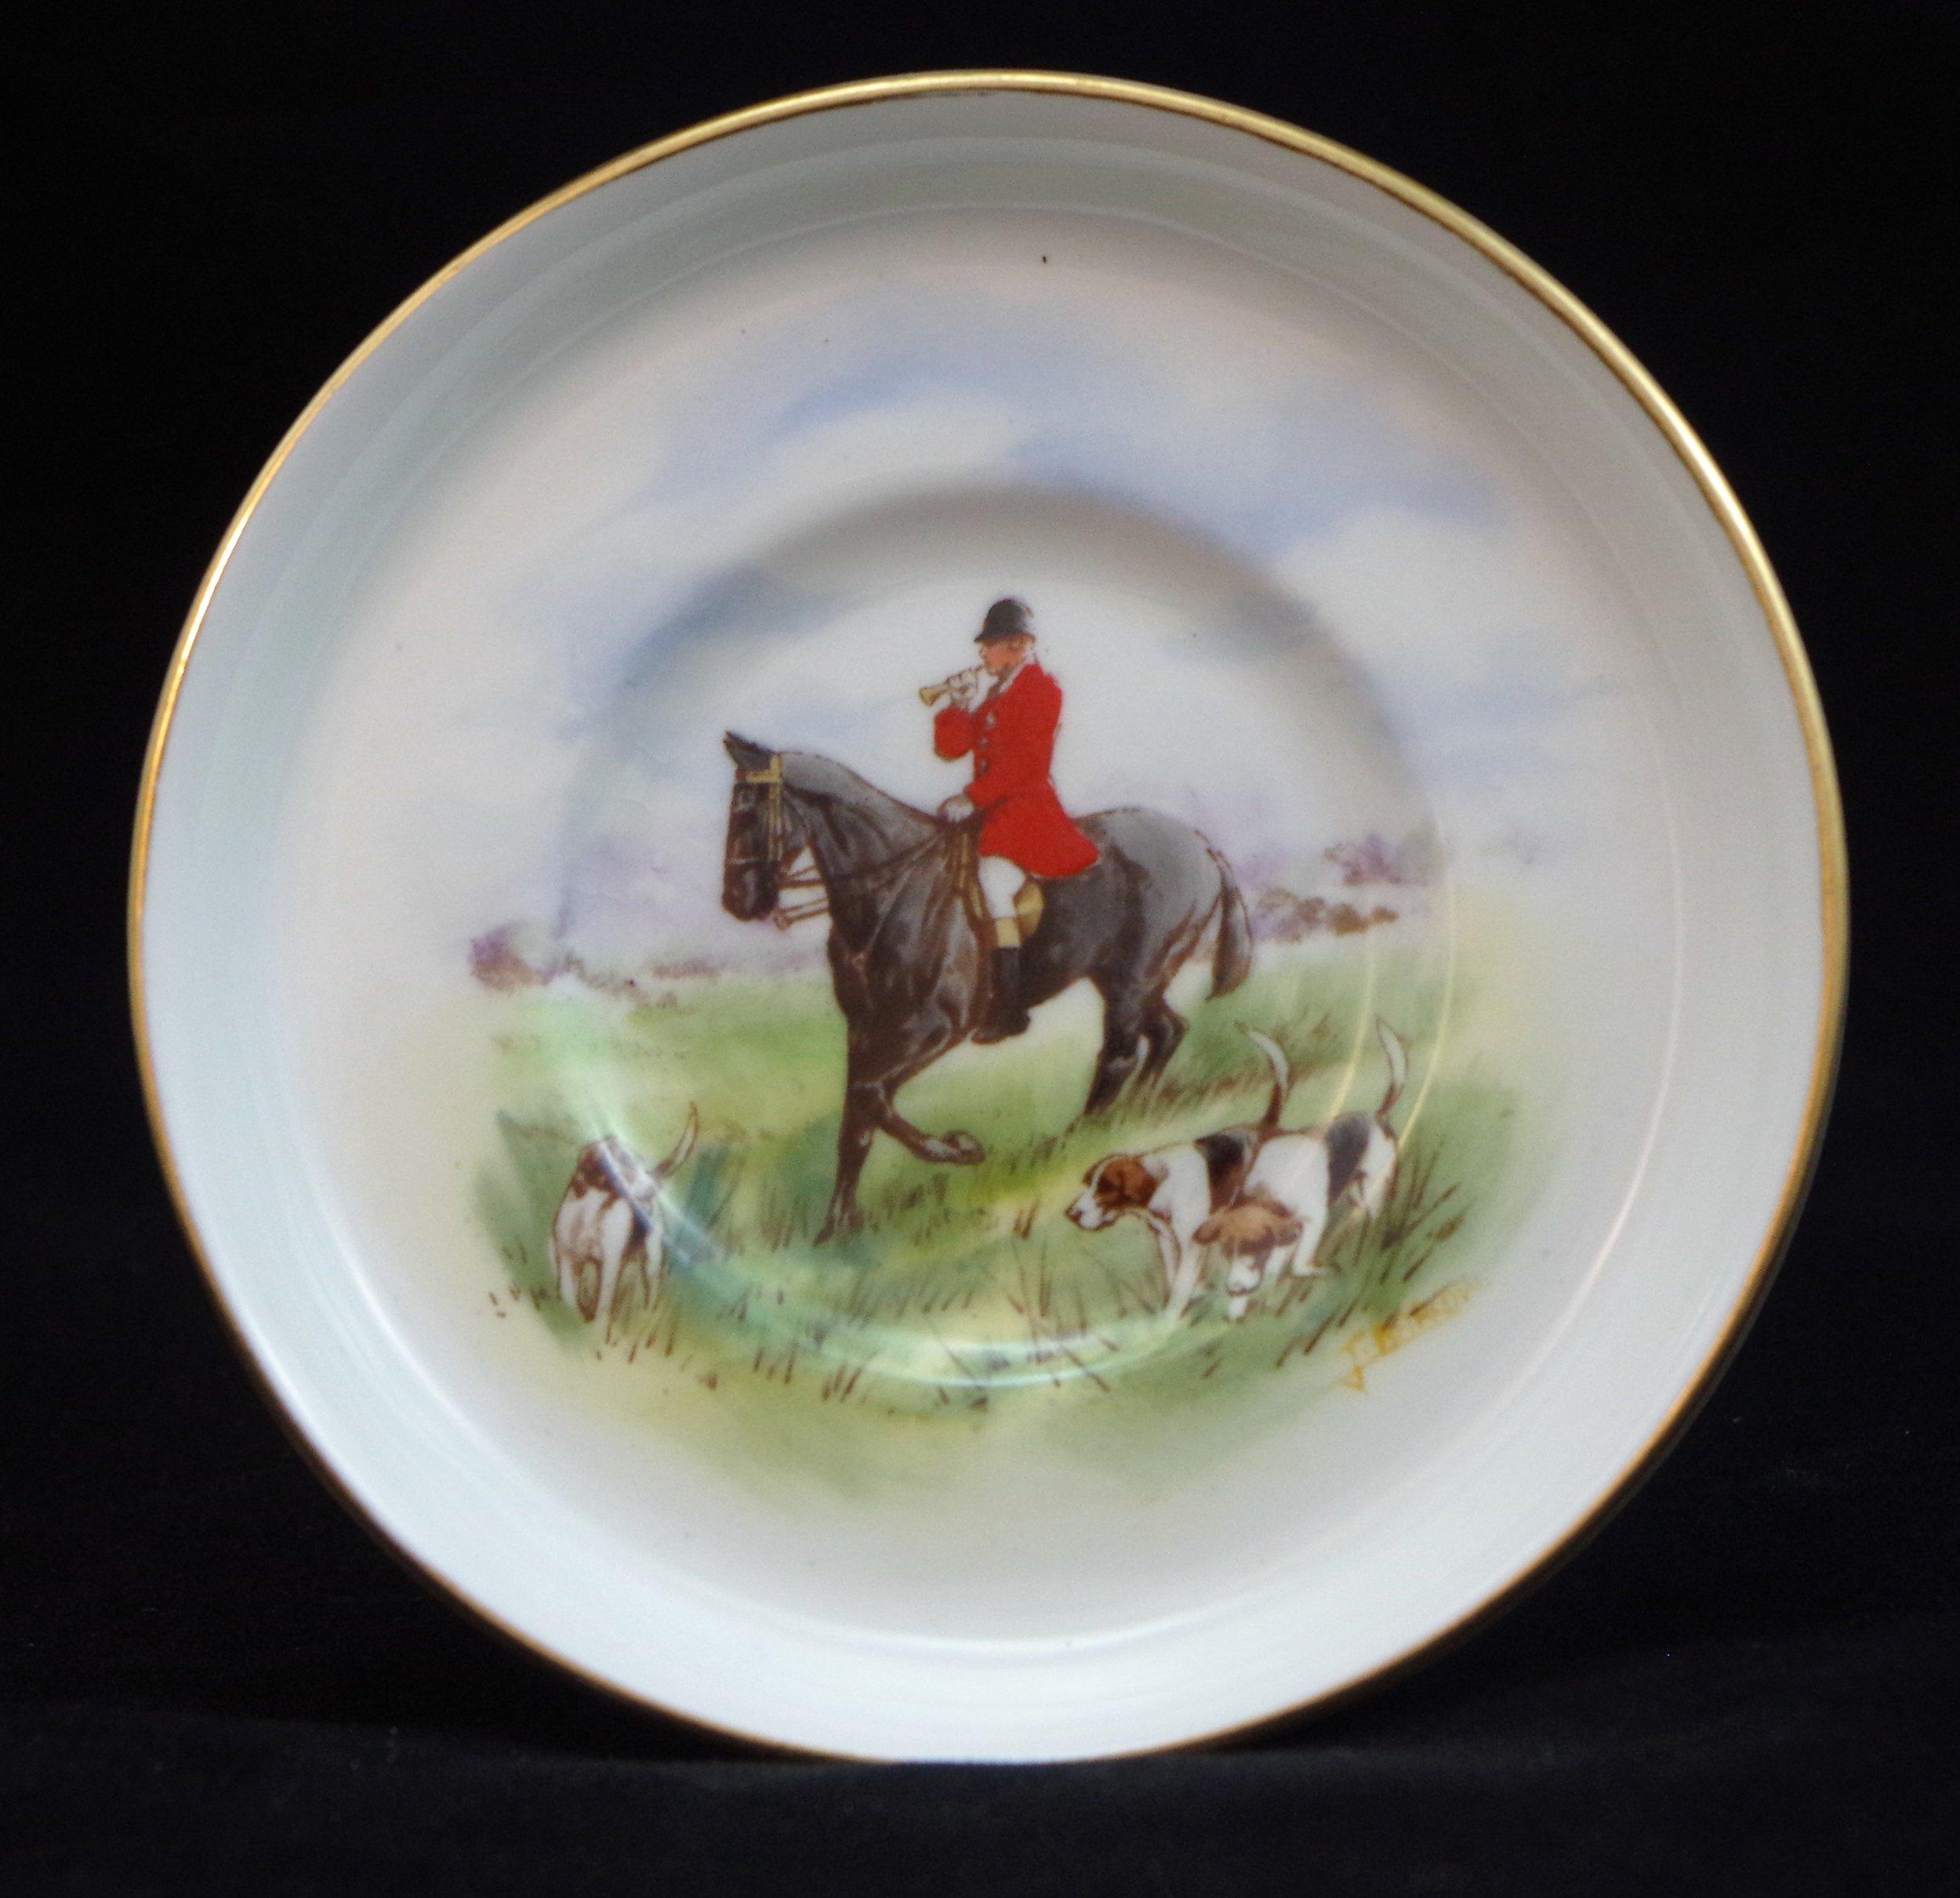 royal-crown-derby-edinburgh-shape-saucer-hunting-scene-